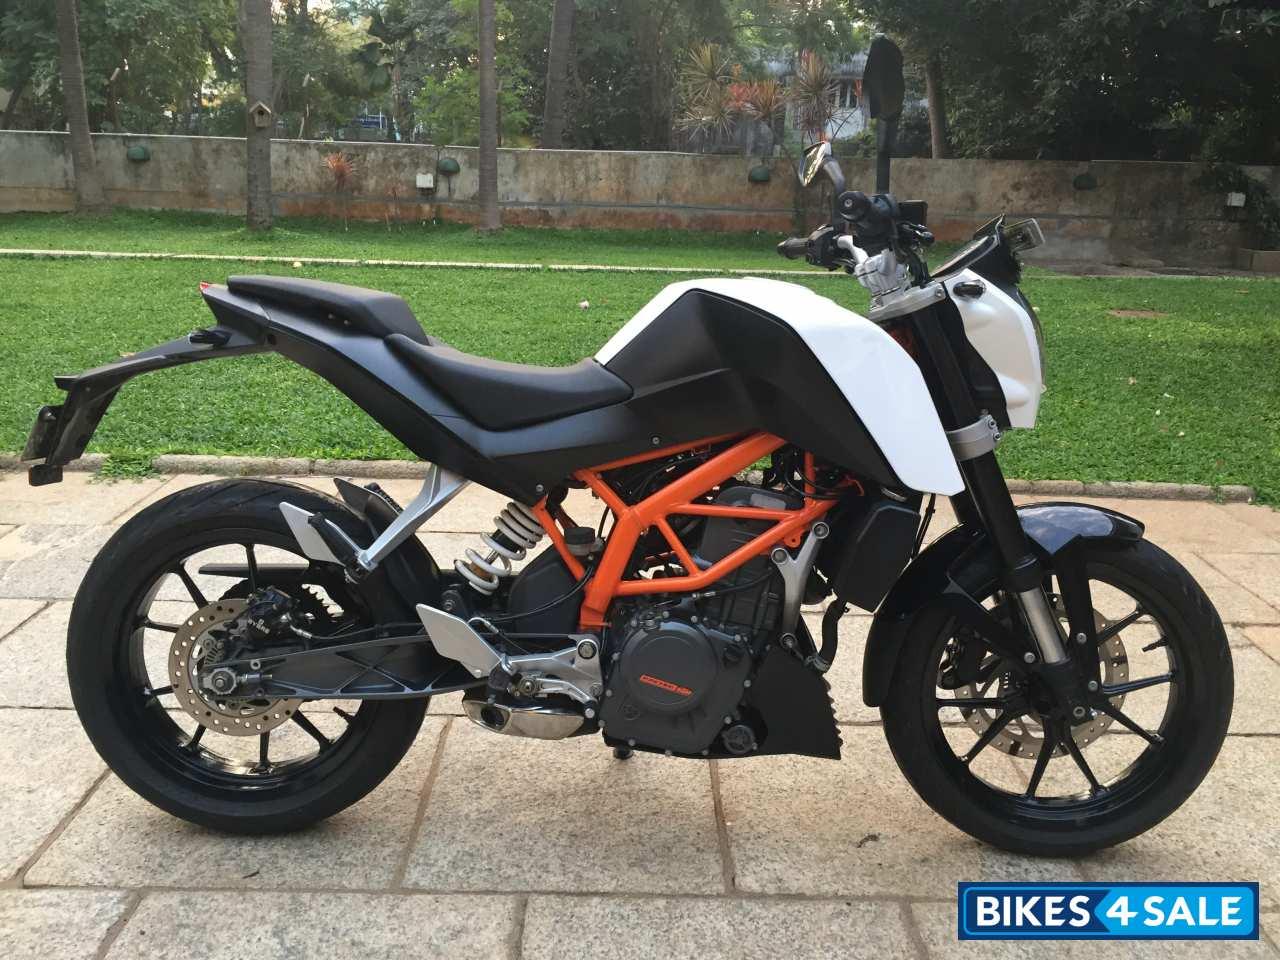 white black ktm duke 390 picture 1 album id is 127192 bike located in chennai bikes4sale. Black Bedroom Furniture Sets. Home Design Ideas